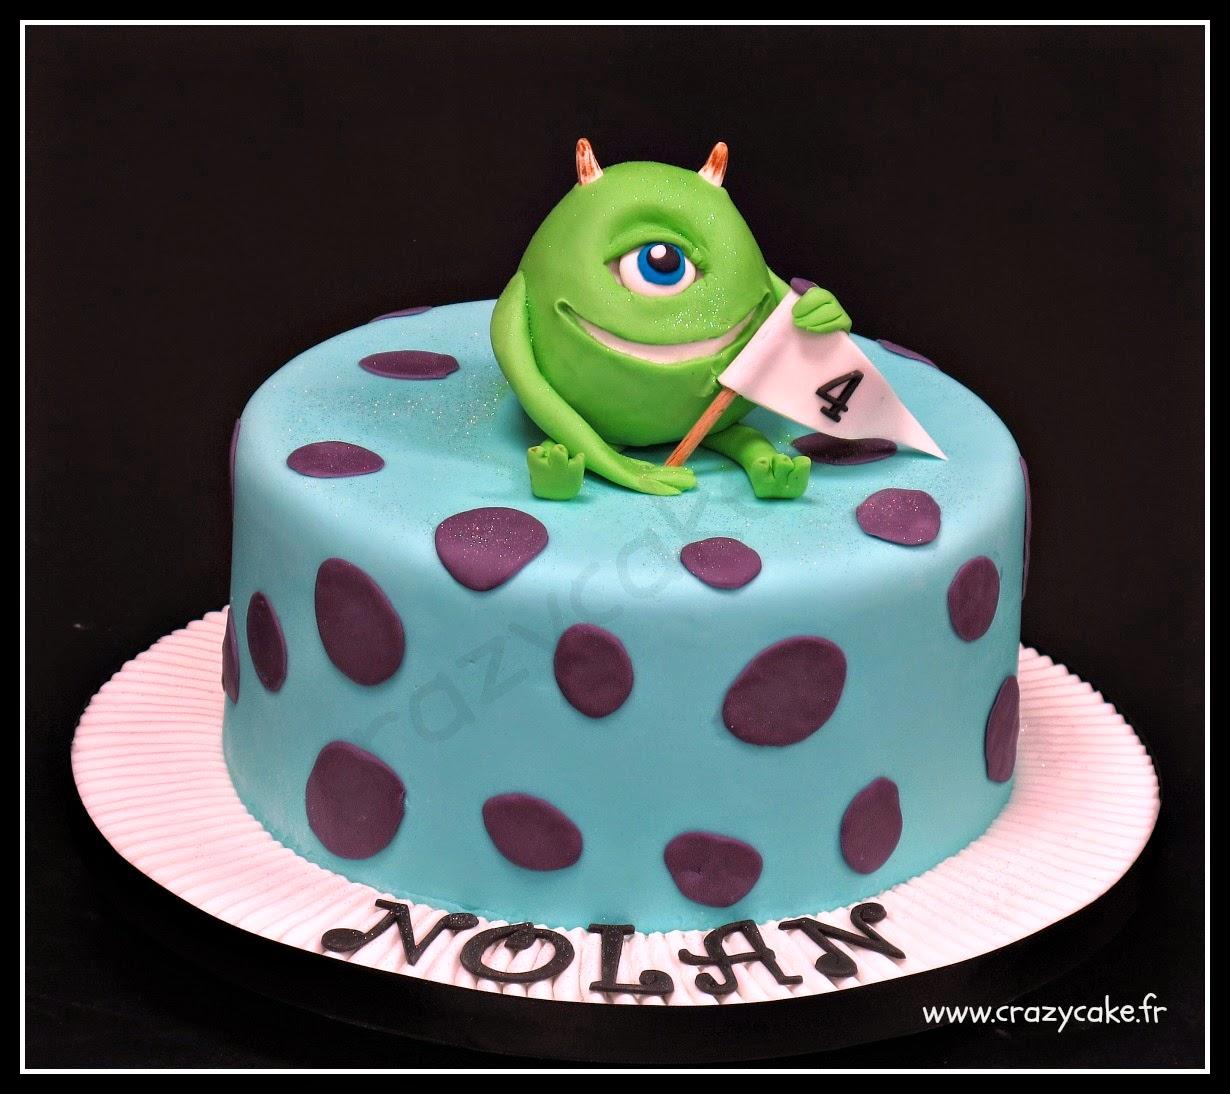 CRAZY CAKE - CAKE DESIGN, THIONVILLE, METZ, LUXEMBOURG ...